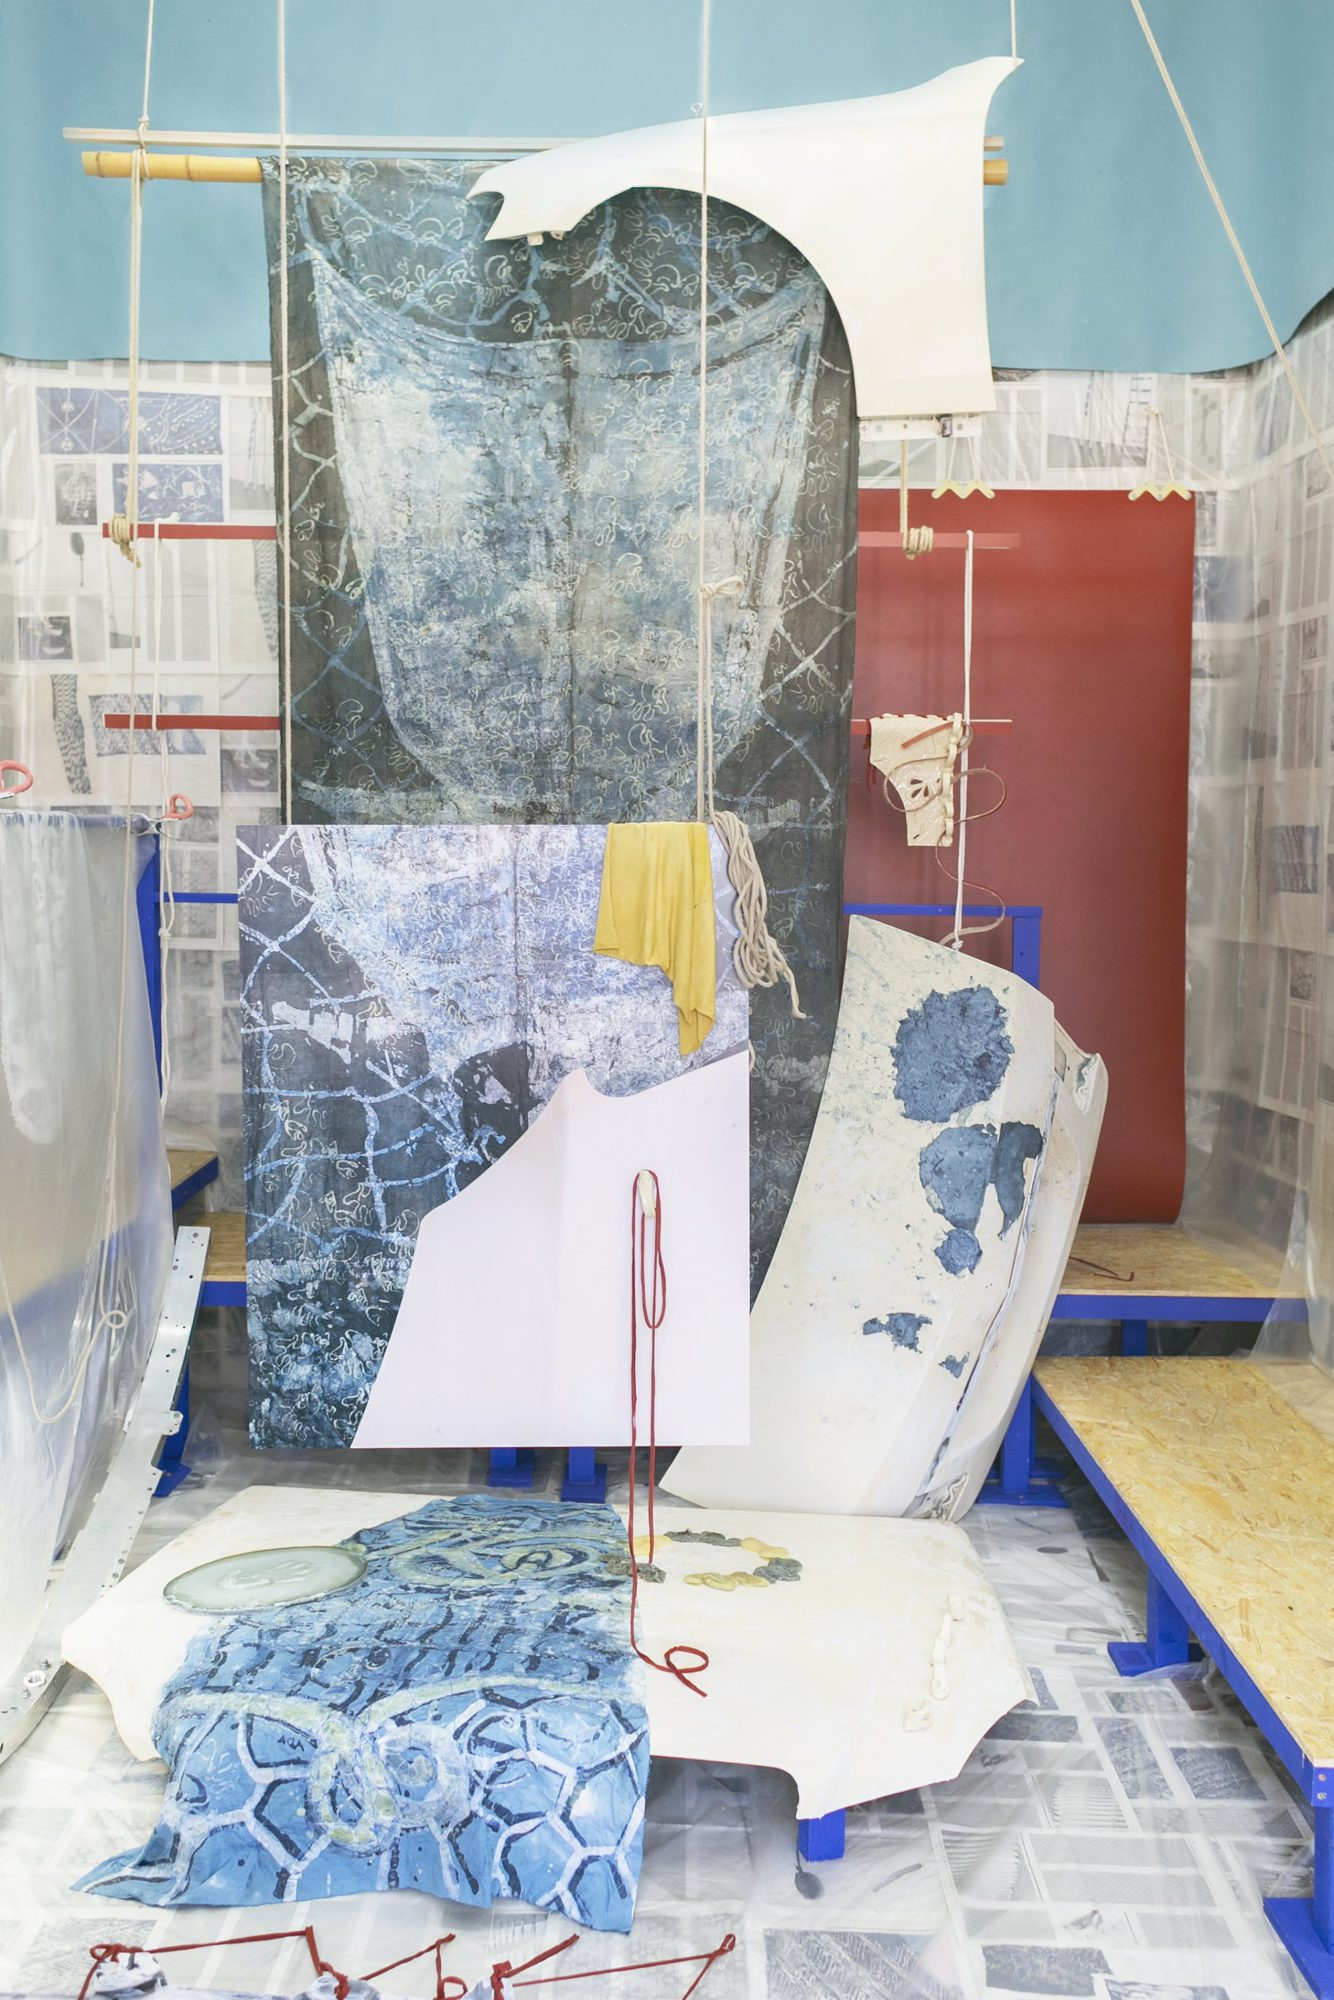 <p>Ada Van Hoorenbeke, Goods & Services, 2019, Installationsansicht, Foto: Anastasia Muna</p>